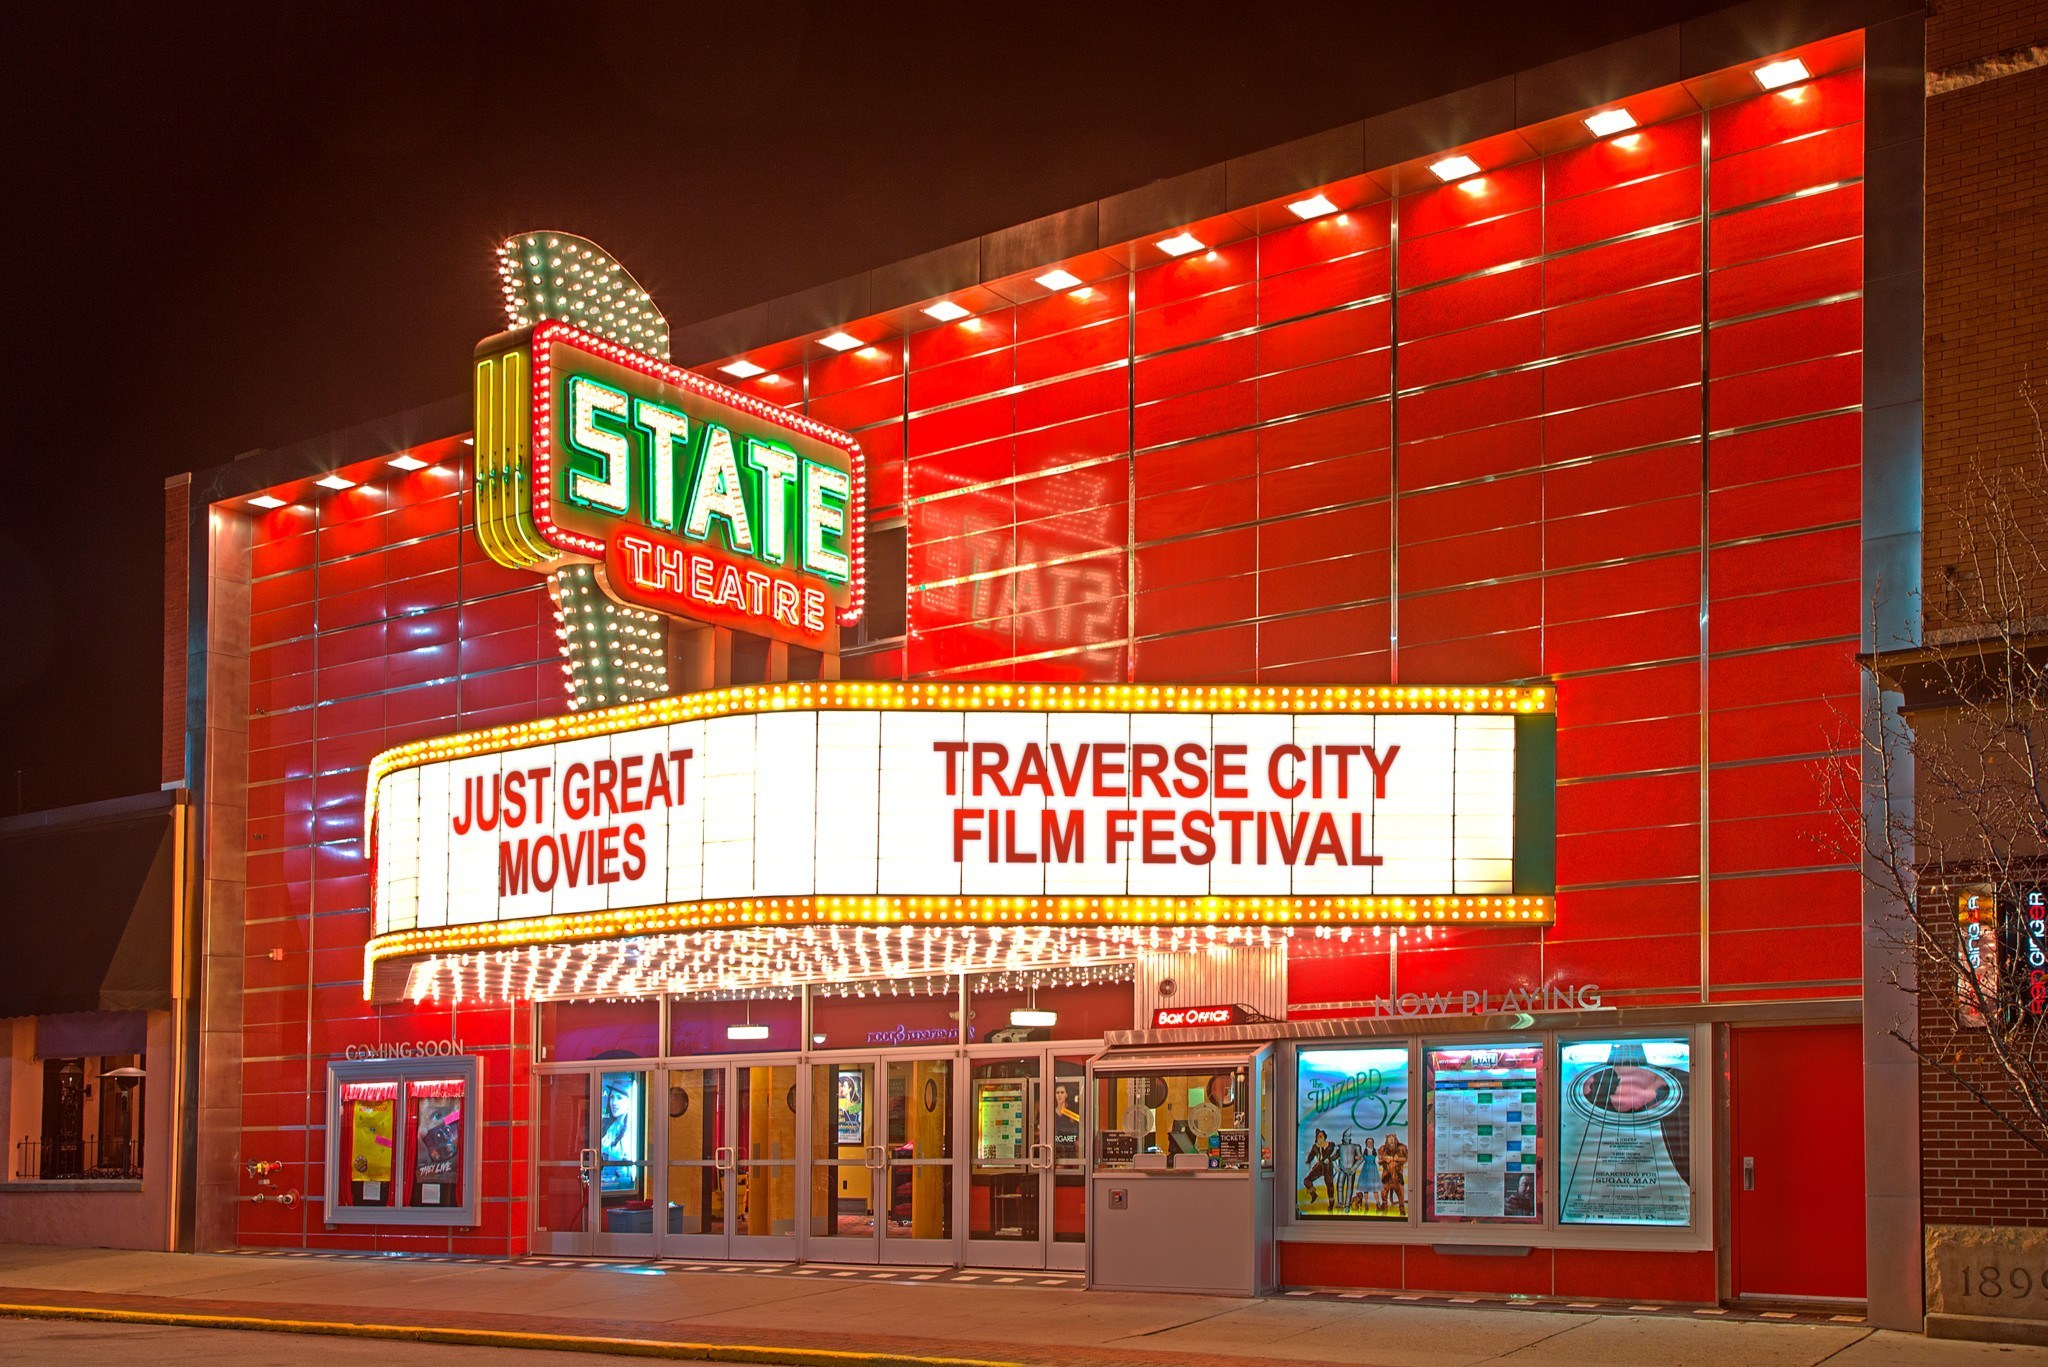 Traverse City Film Festival.jpg